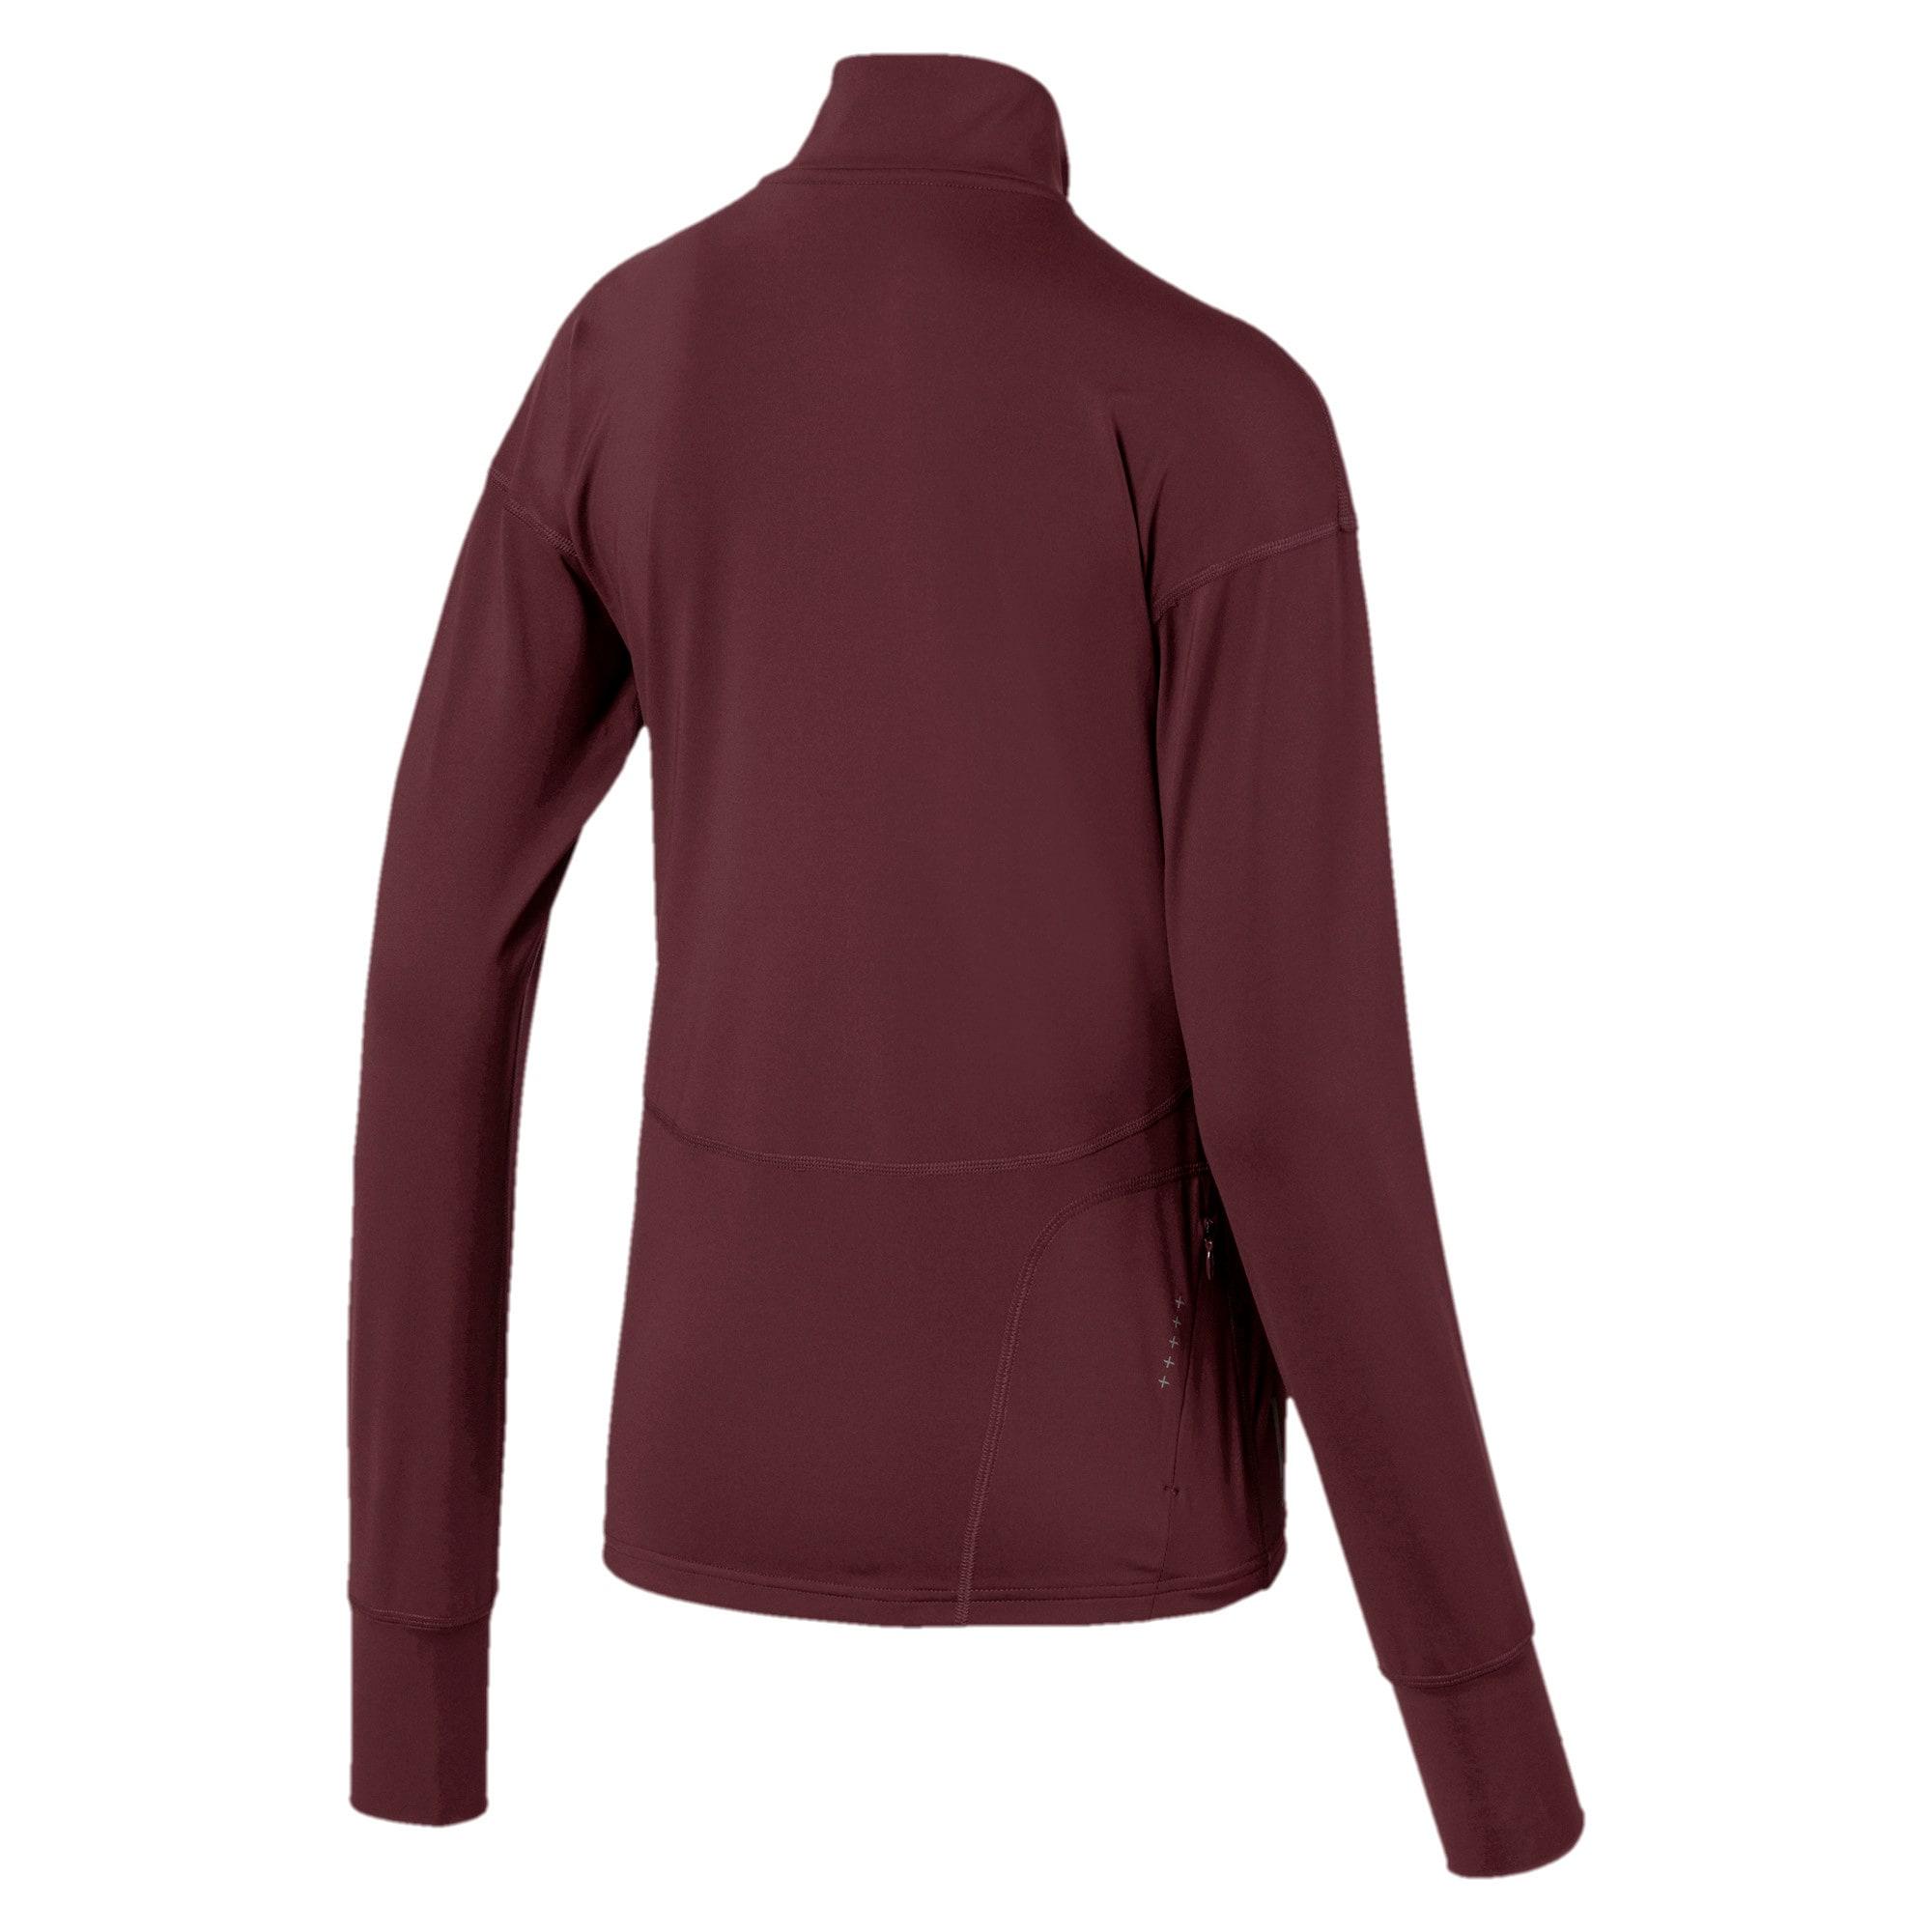 Thumbnail 5 of Ignite Long Sleeve Women's Running Pullover, Vineyard Wine, medium